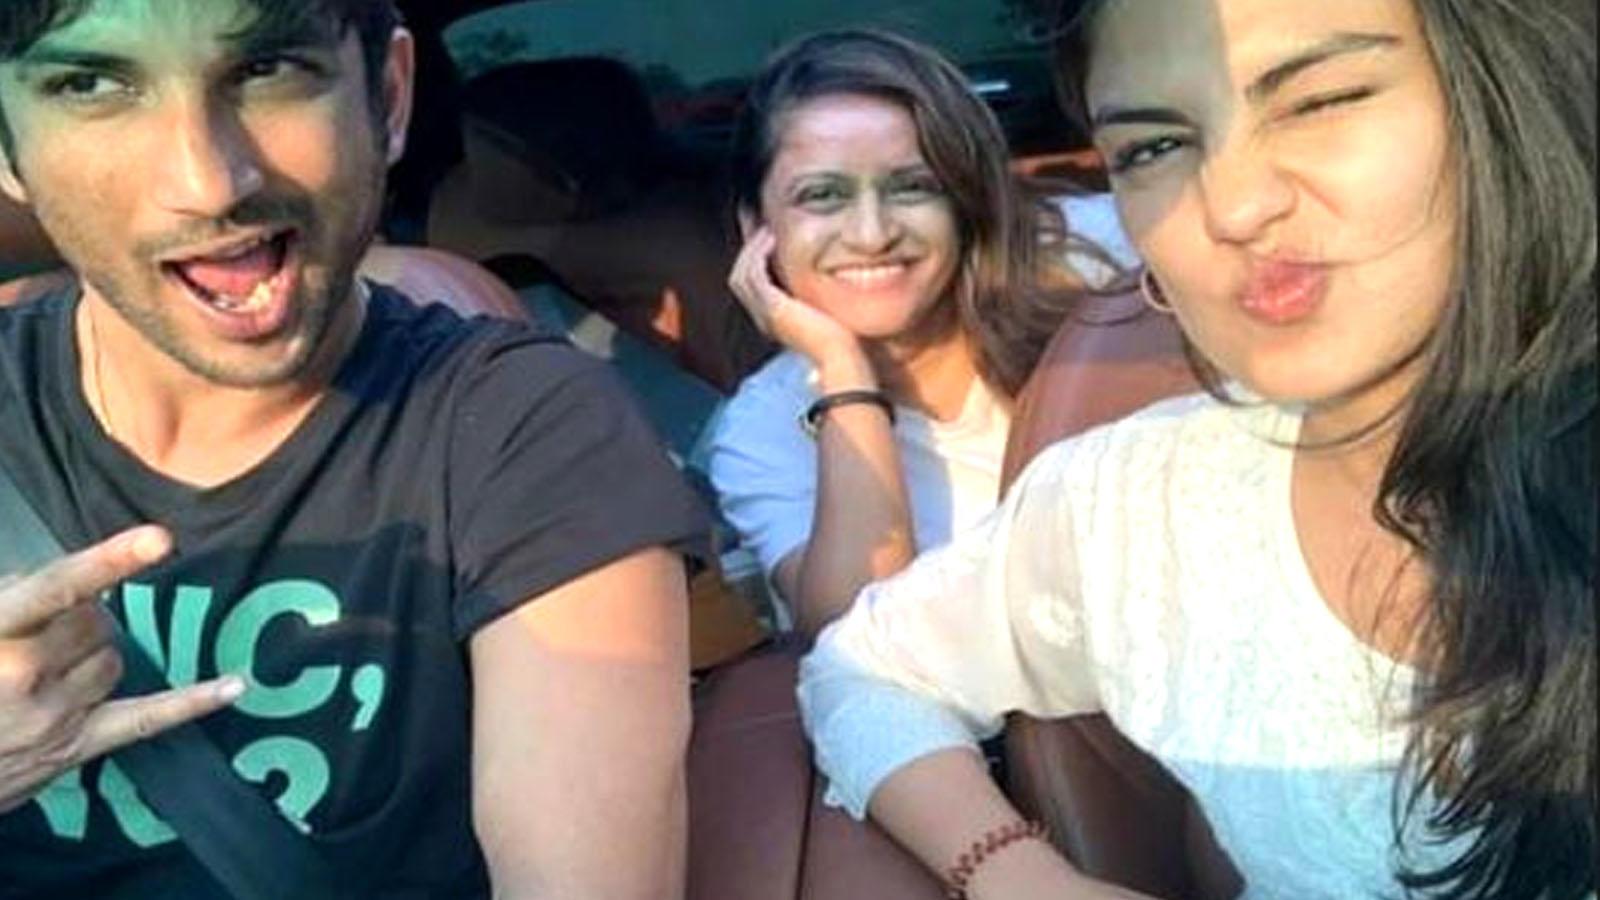 Sushant Singh Rajput and Rhea Chakraborty indulge in some fun banter on social media